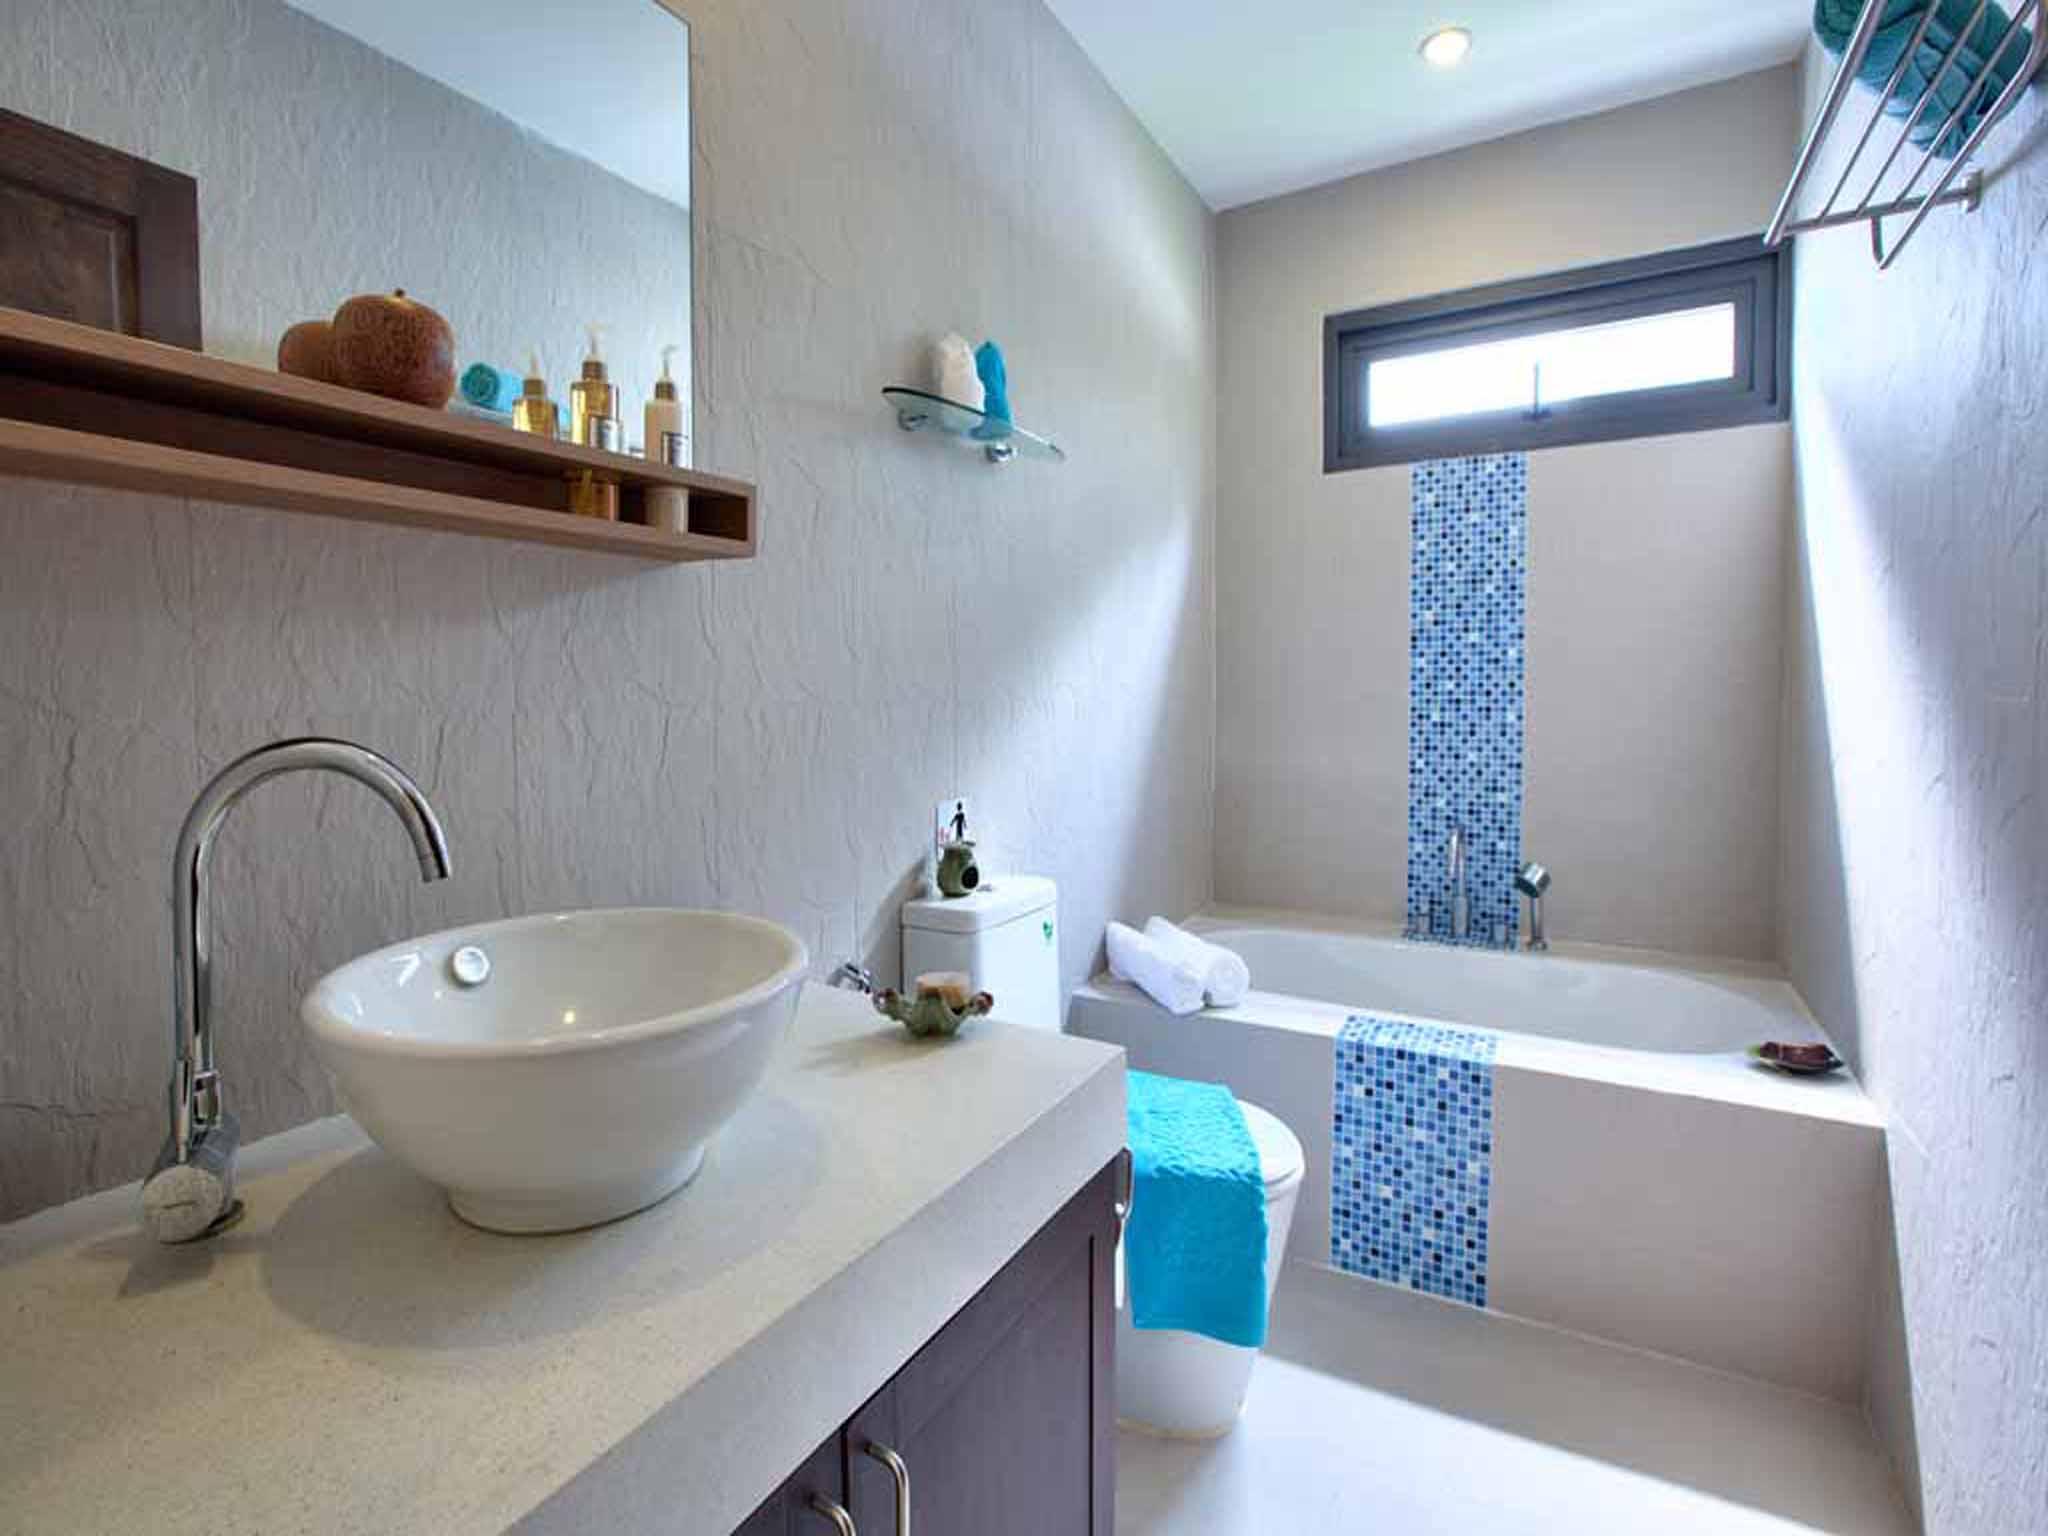 3 Bedroom Villa for Rent in Plai Laem, Koh Samui